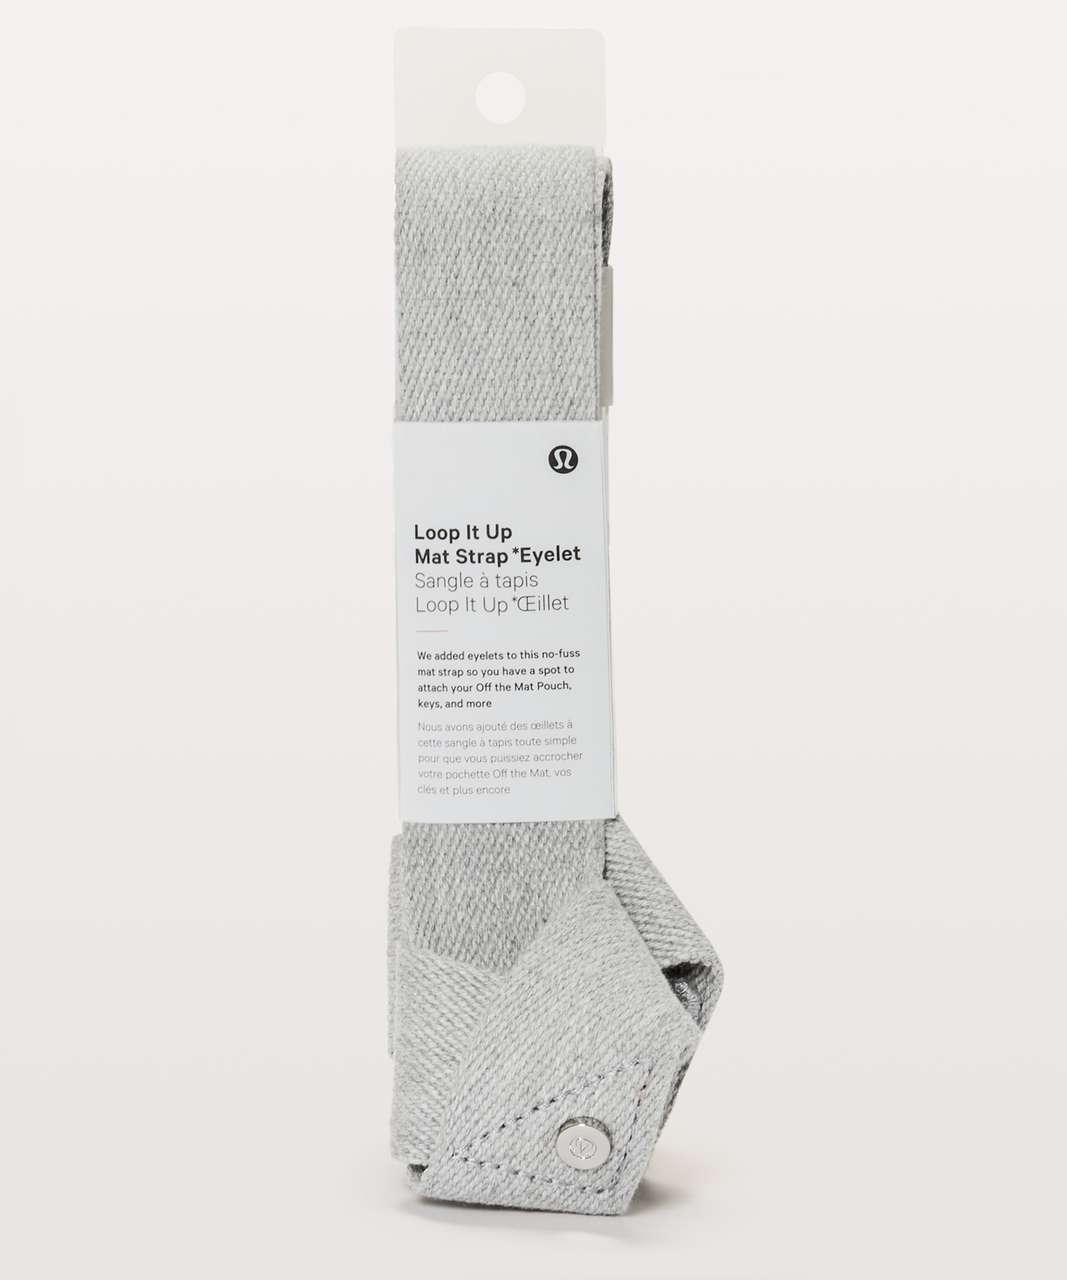 Lululemon Loop It Up Mat Strap *Eyelet - Heathered Core Light Grey